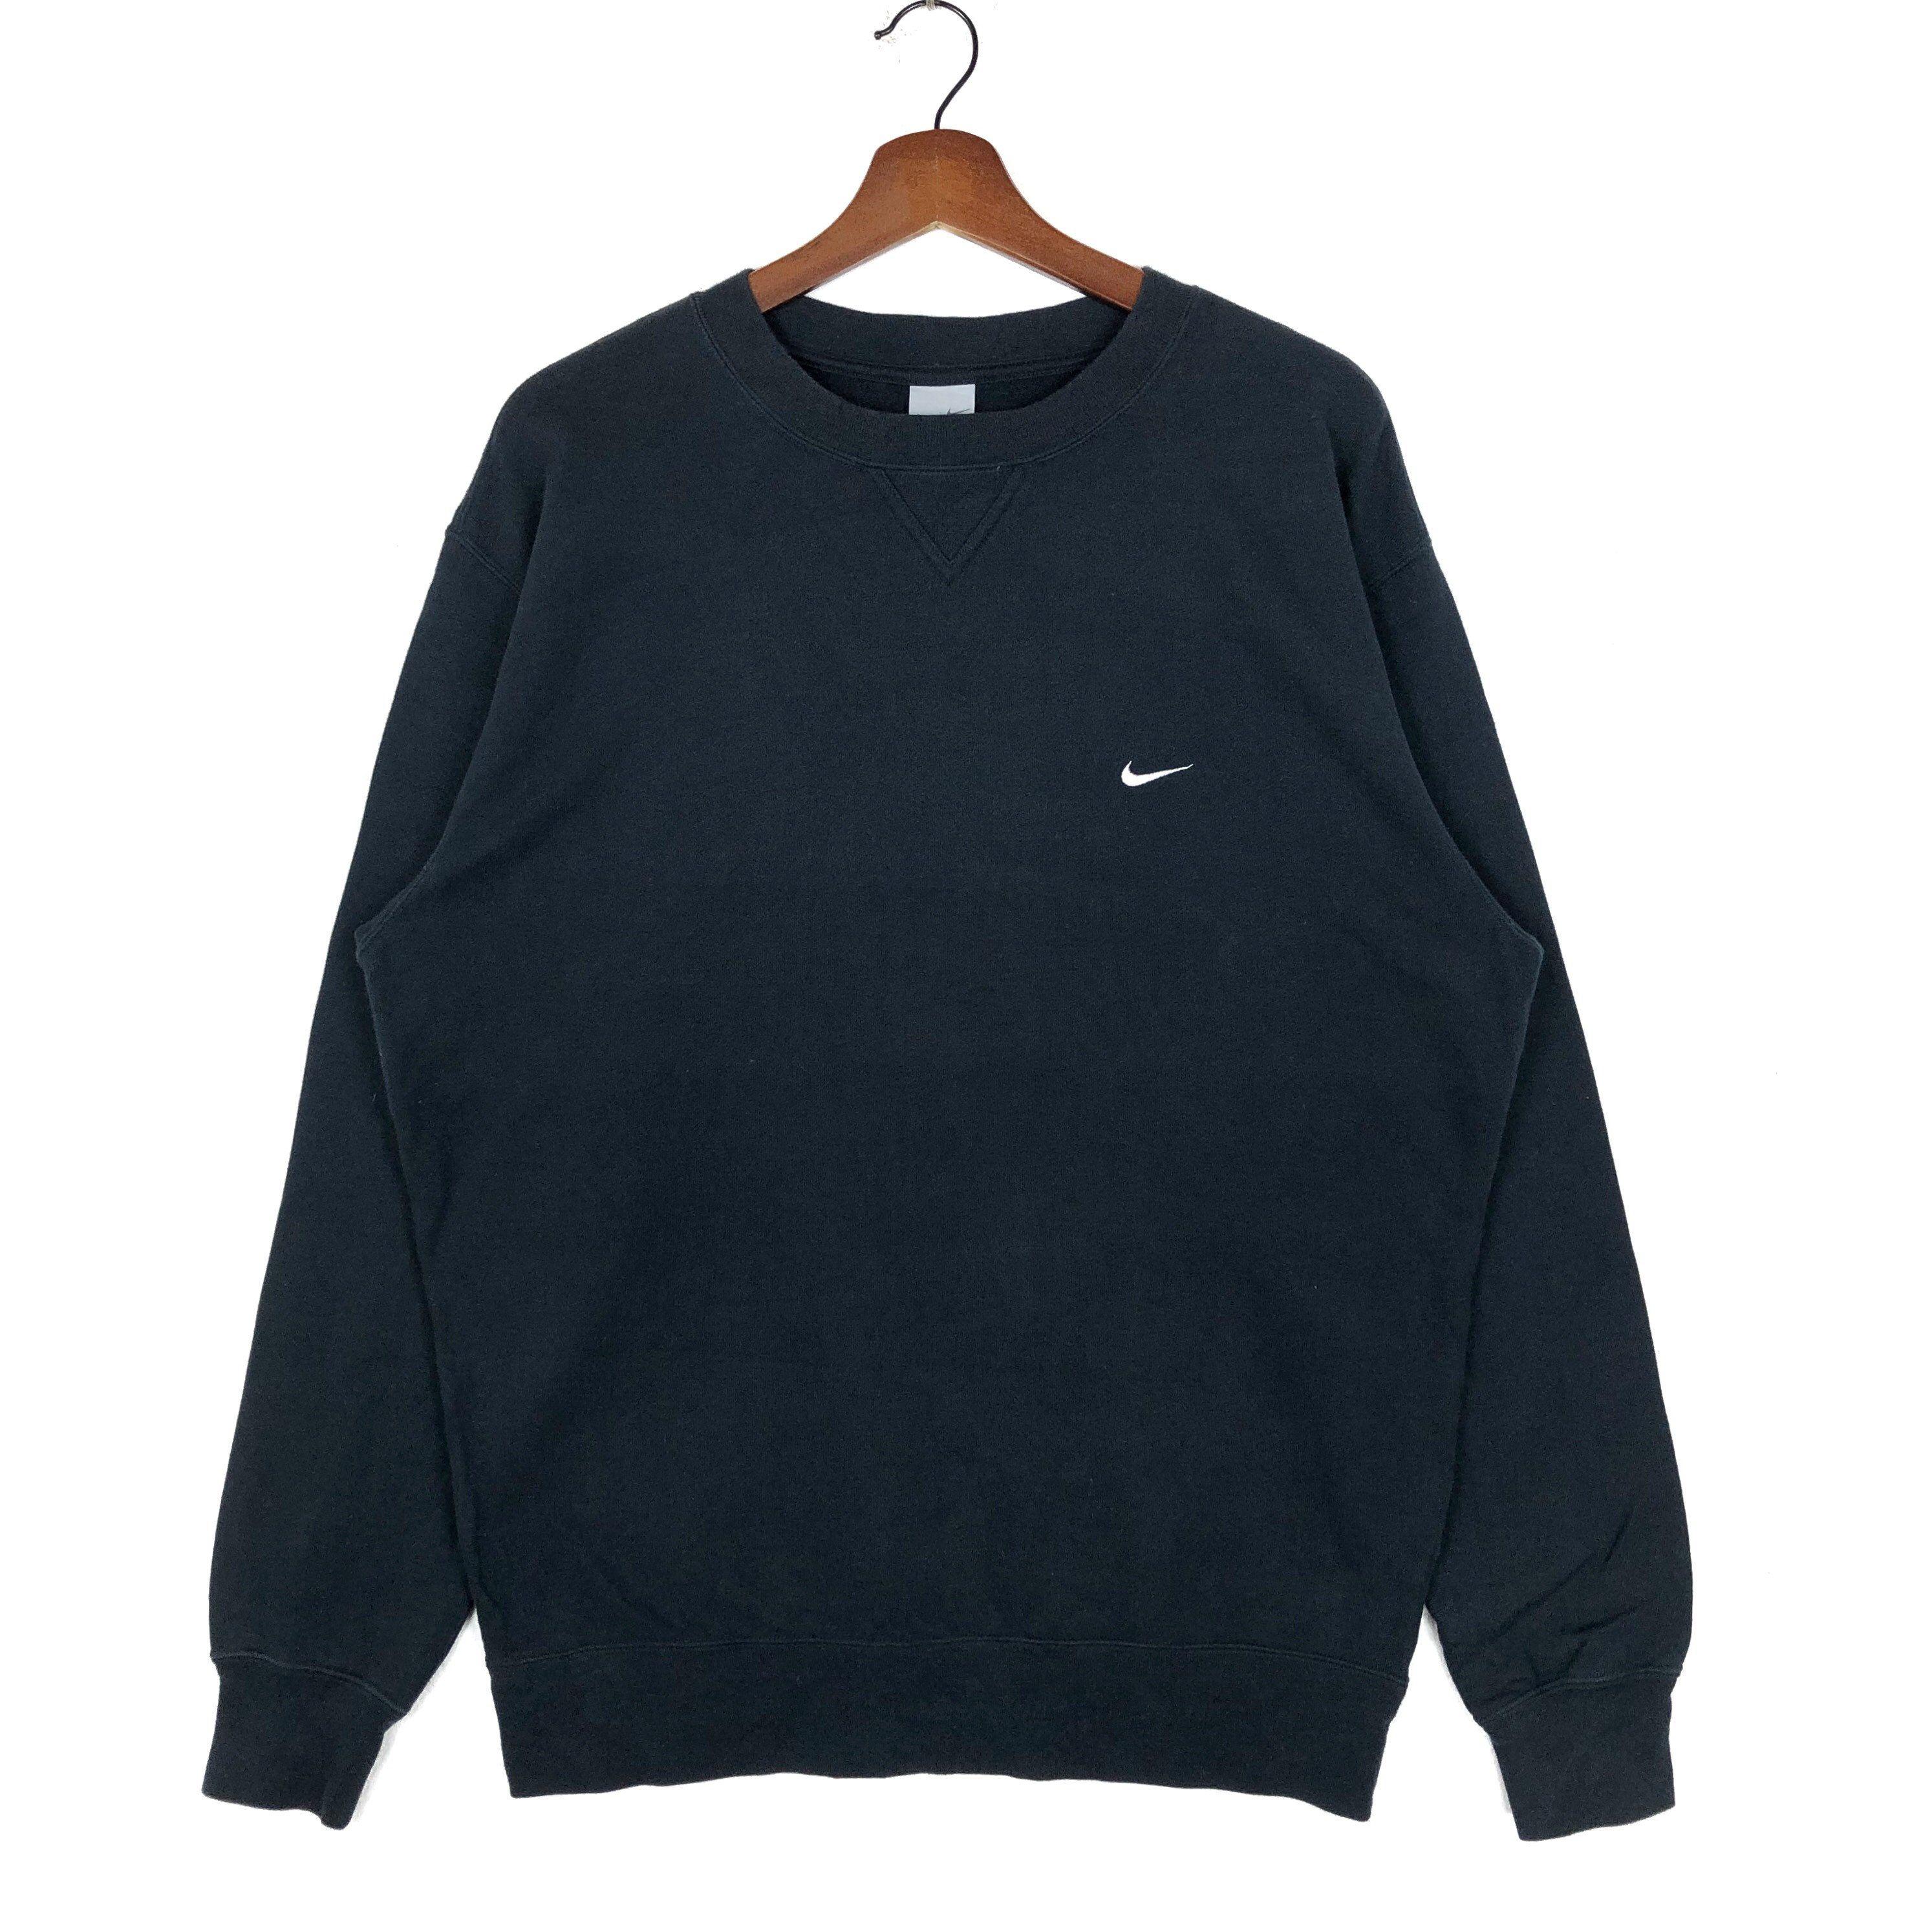 Vintage Nike Swoosh Crewneck Sweatshirt Small Logo Embroidery Etsy Vintage Nike Crew Neck Sweatshirt Nike Pullover [ 2988 x 2988 Pixel ]